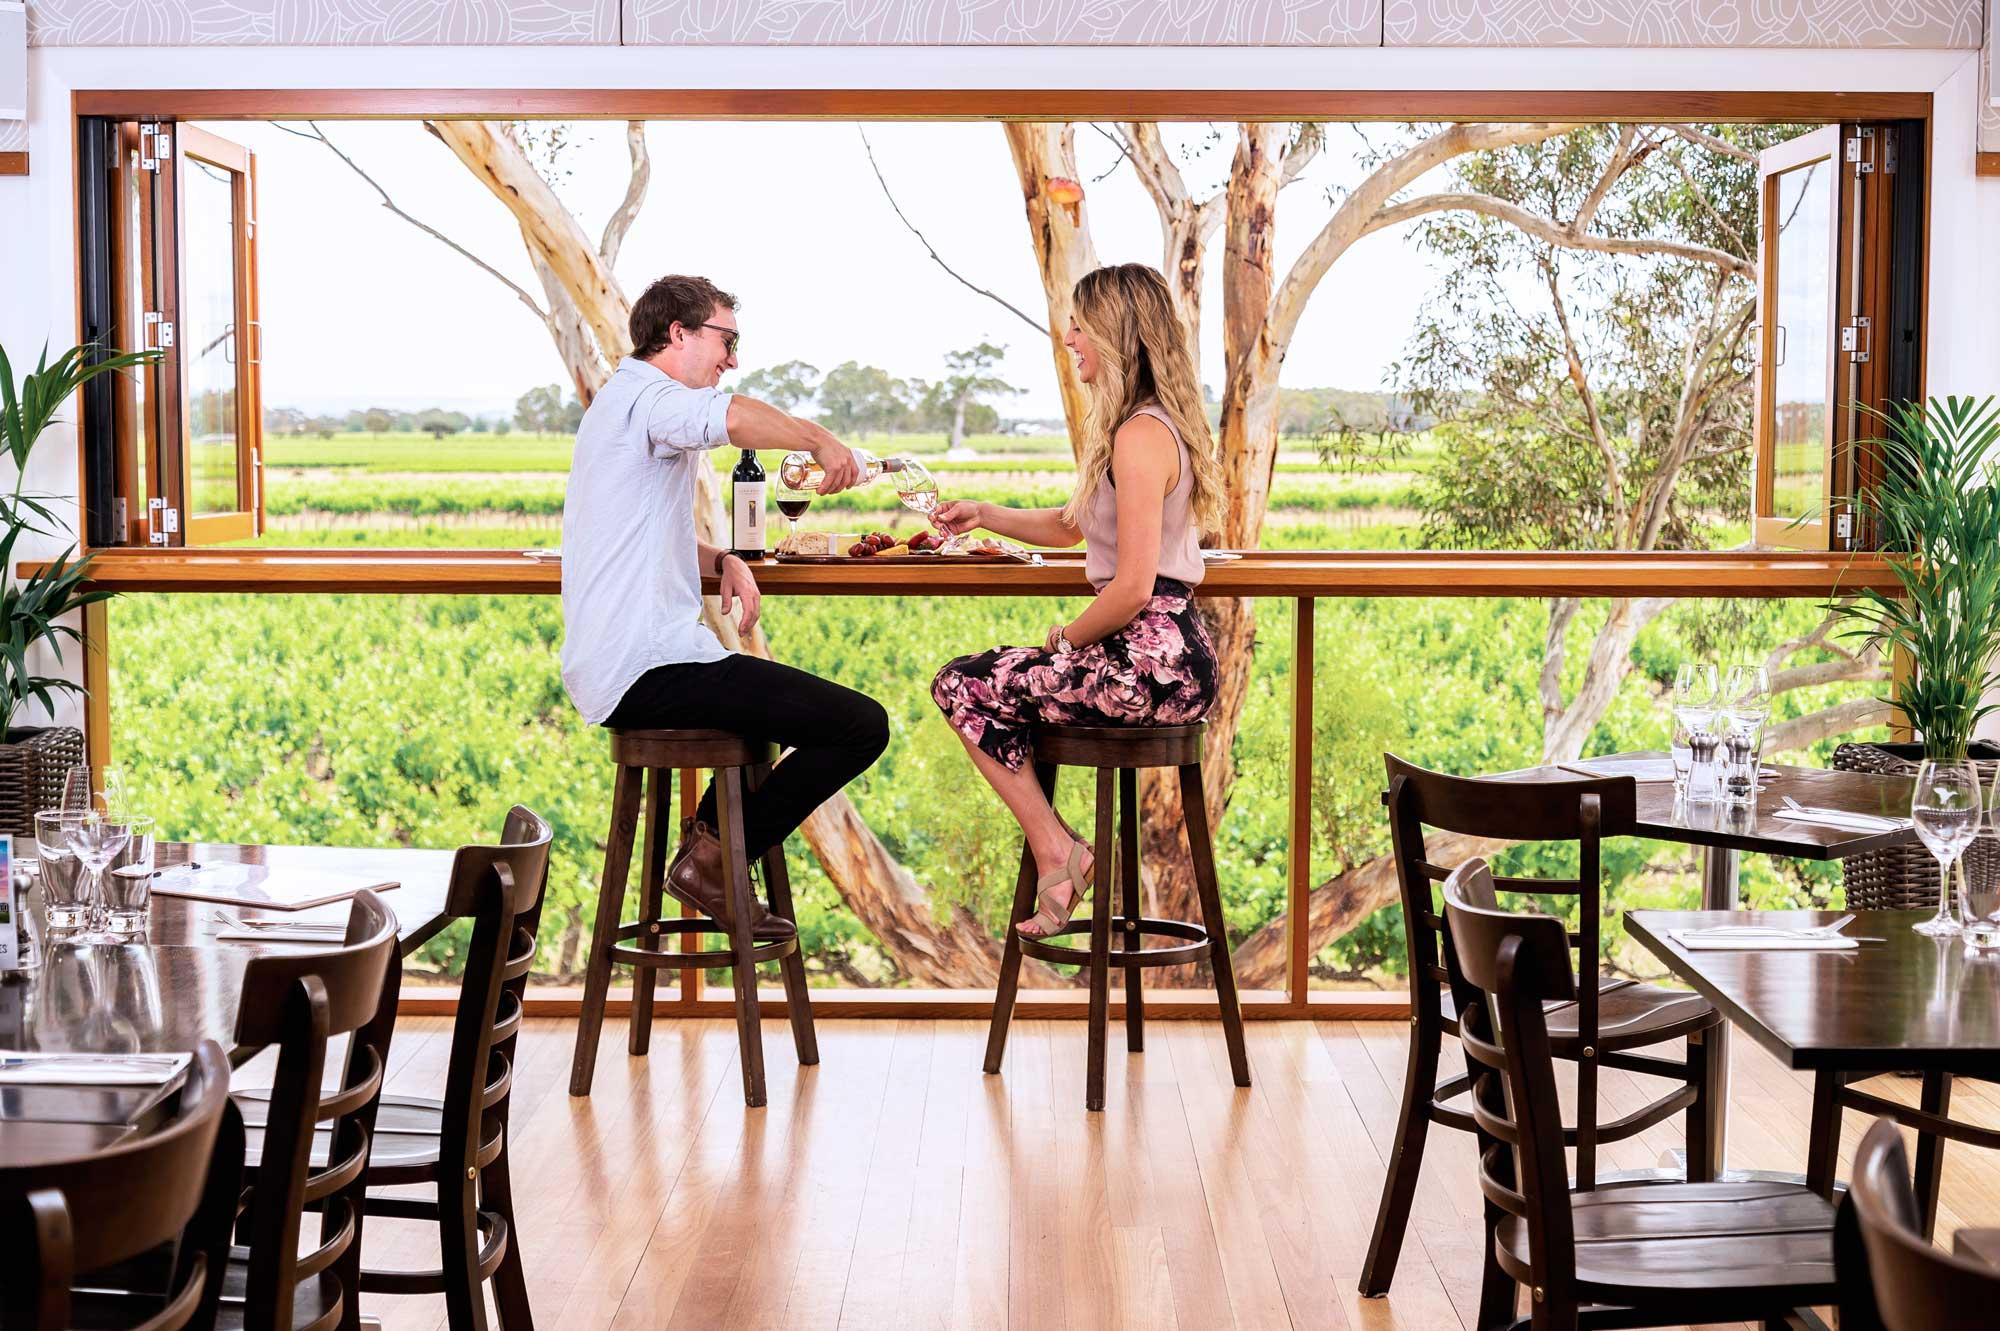 Lake+Breeze+Wines+Restaraunt+Vineyard+Views.jpg